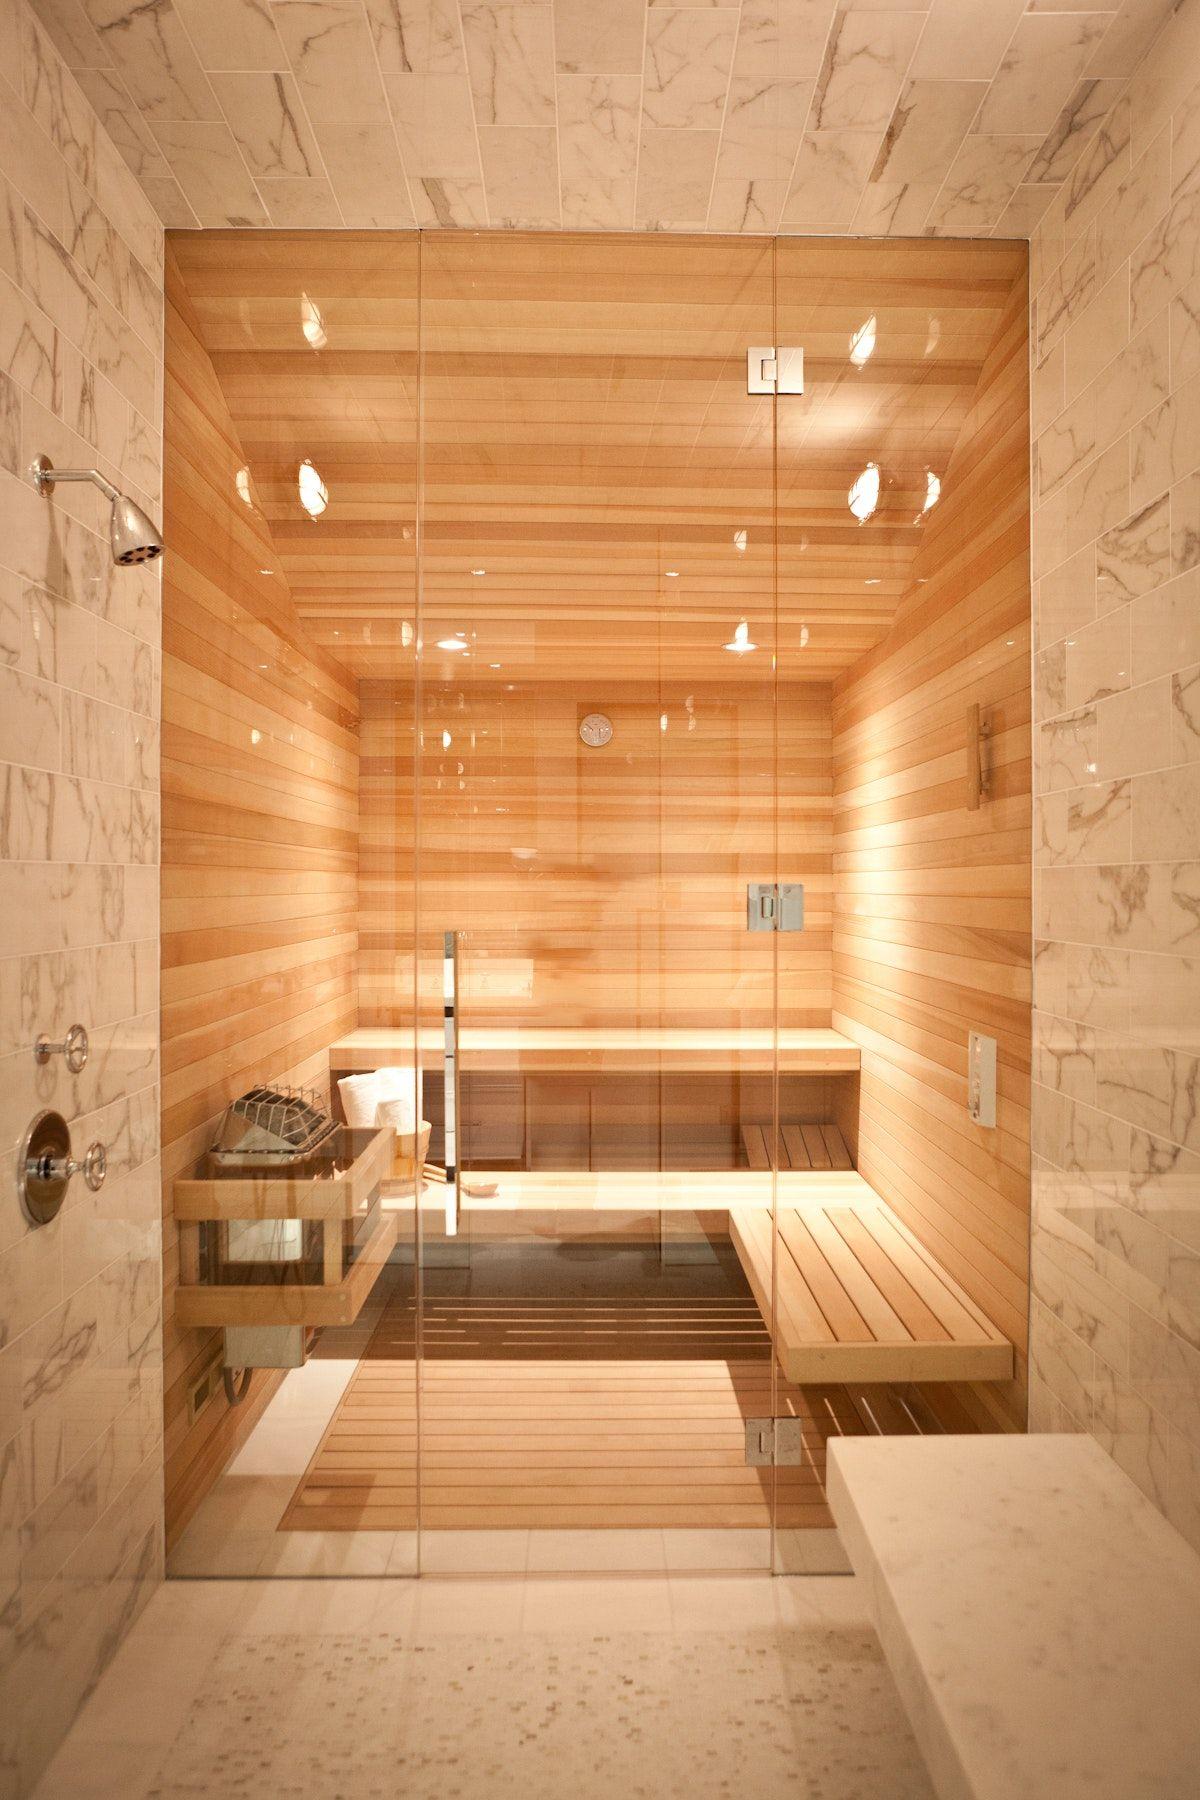 Presidio Heights Residence Featuring Pass Through Sauna Steam Room